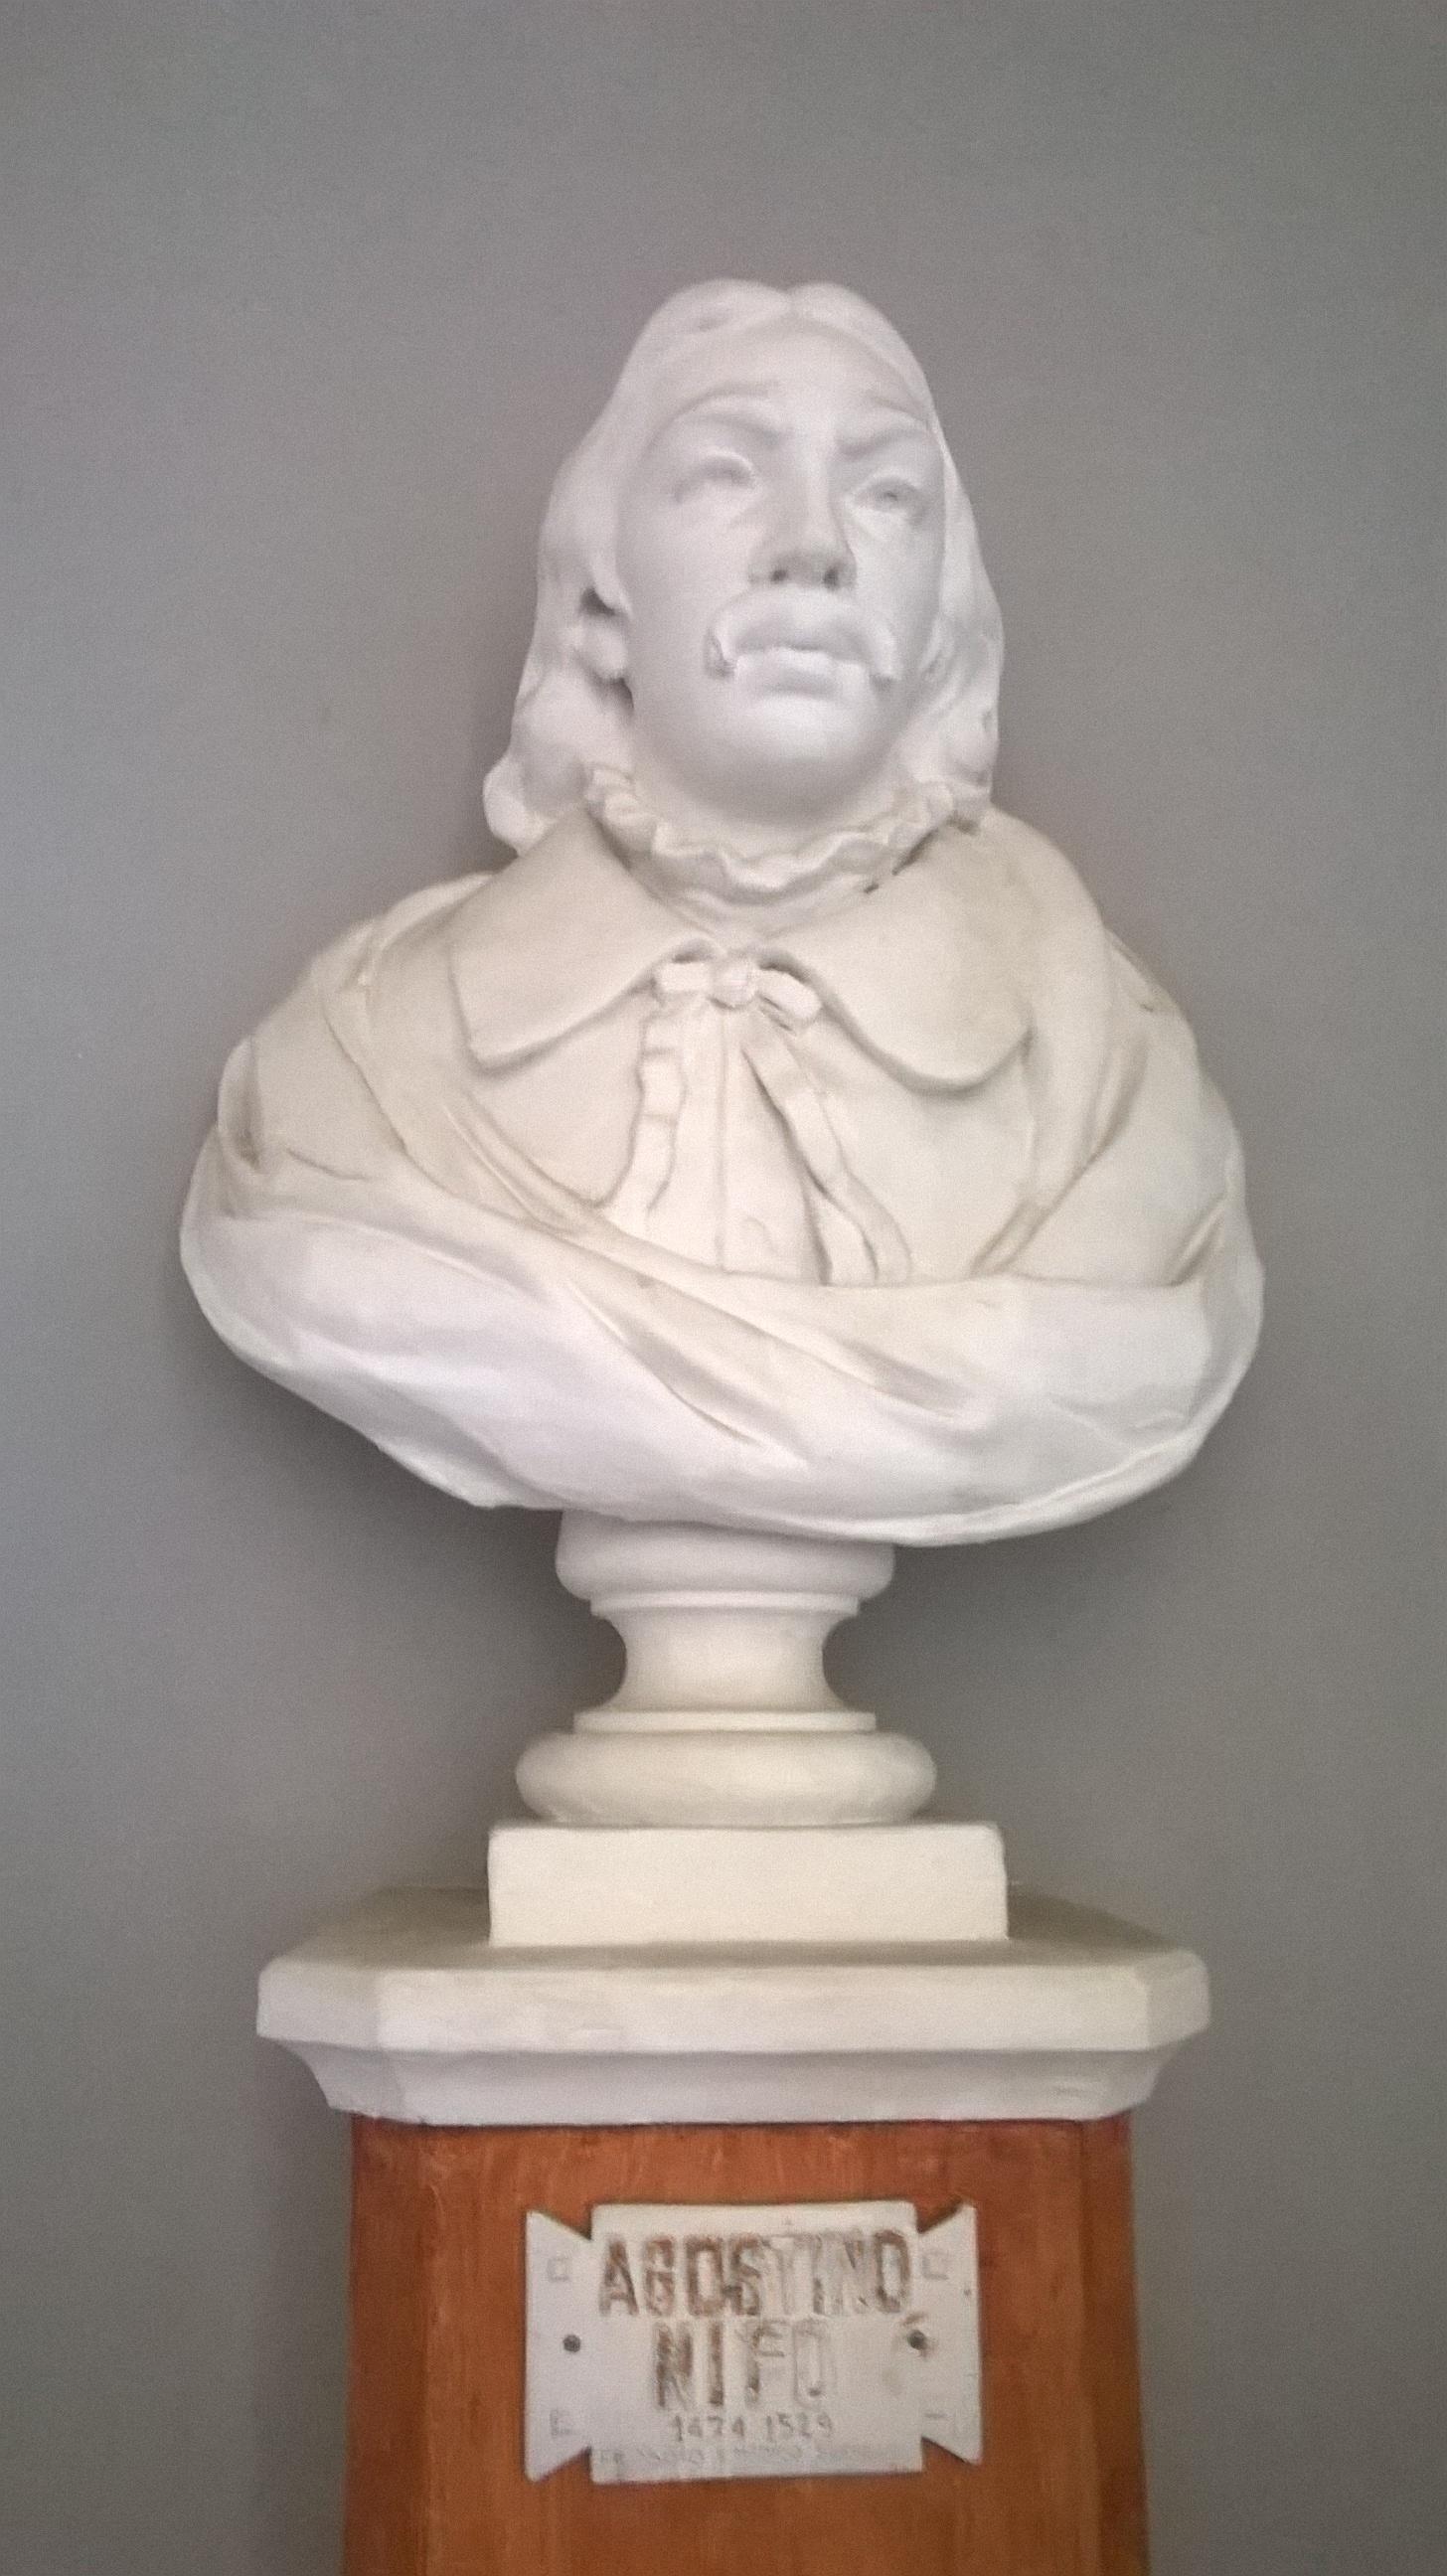 Bust of Agostino Nifo ([[Liceo classico